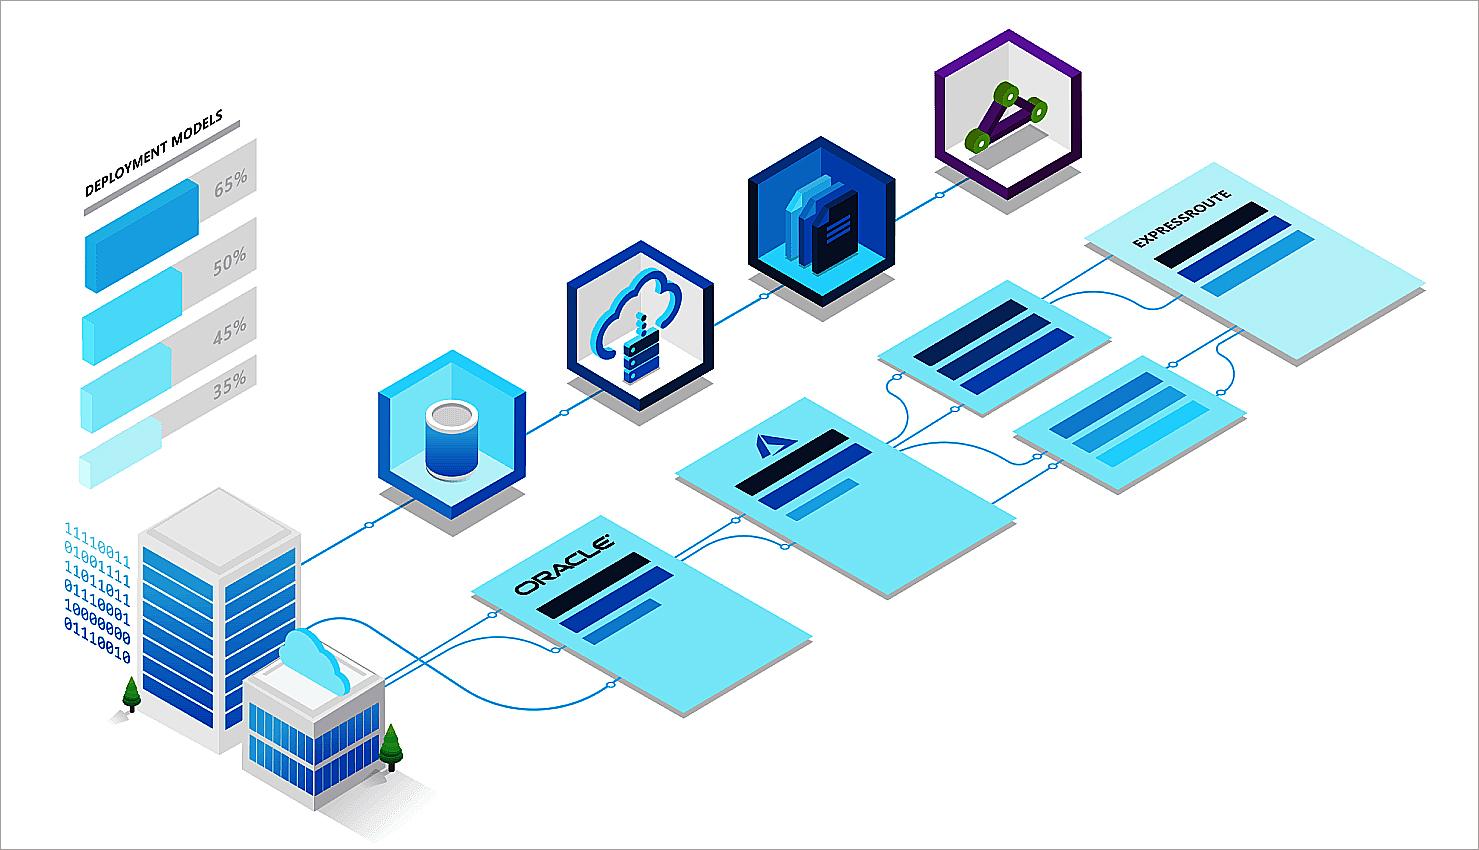 Cloud majors build bridges to interconnect Microsoft Azure and Oracle Cloud